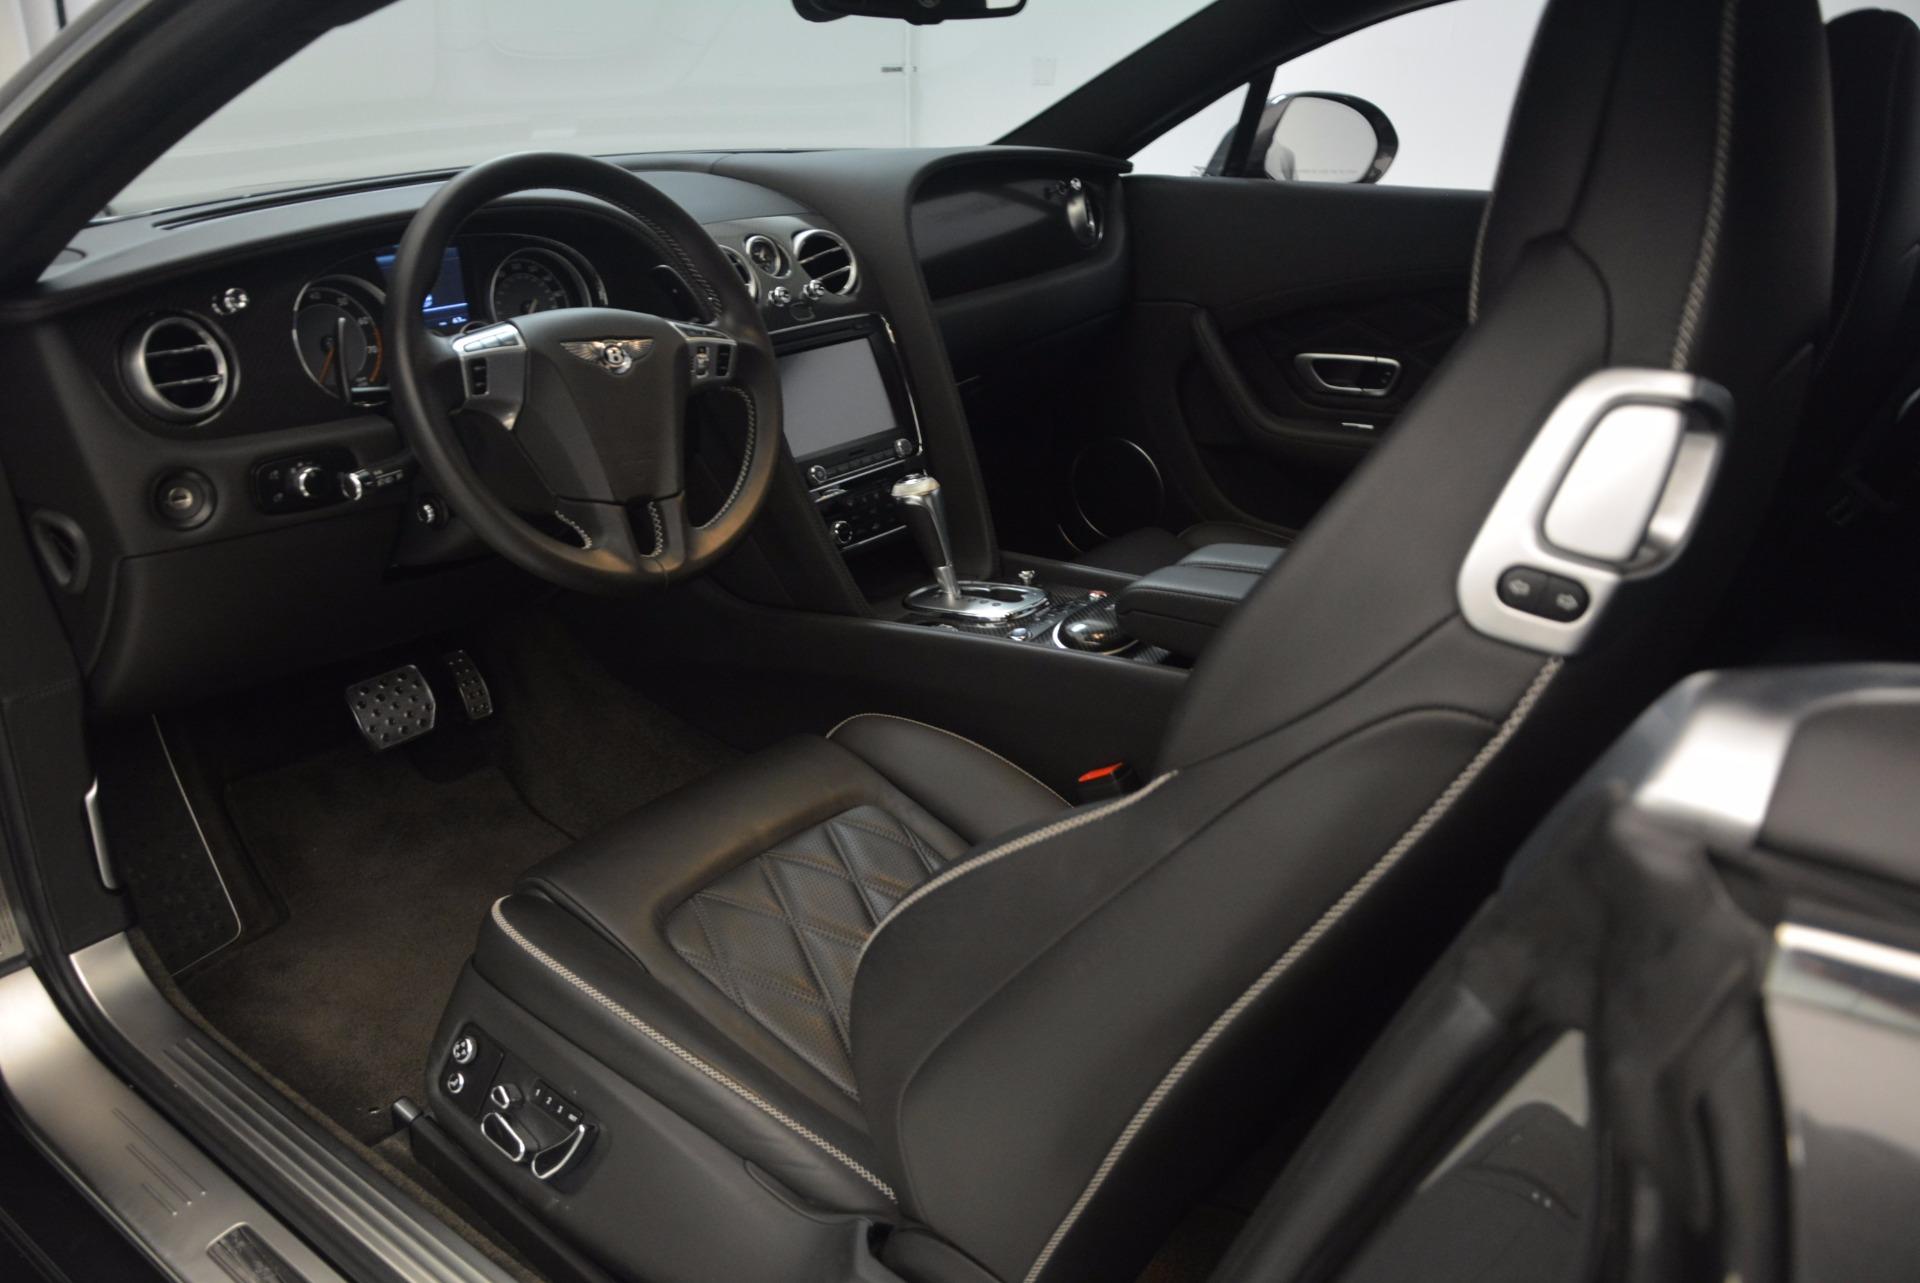 Used 2014 Bentley Continental GT Speed For Sale In Westport, CT 1473_p19